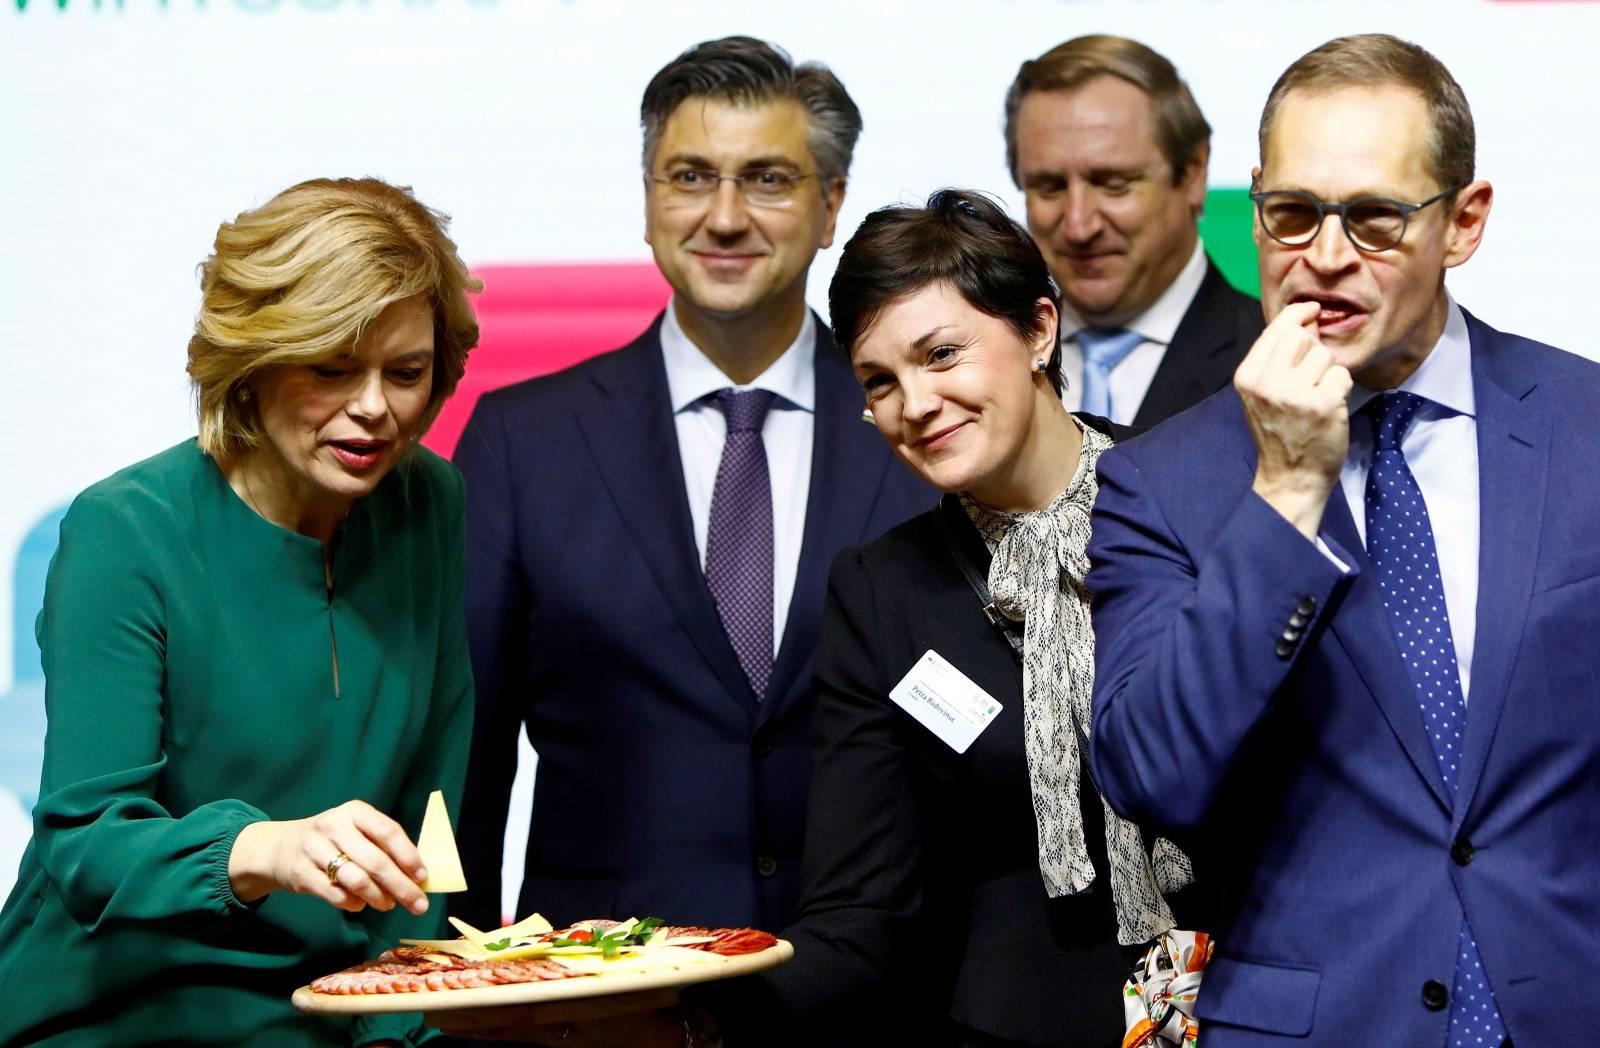 The International Green Week (Internationale Gruene Woche) agriculture and food fair in Berlin